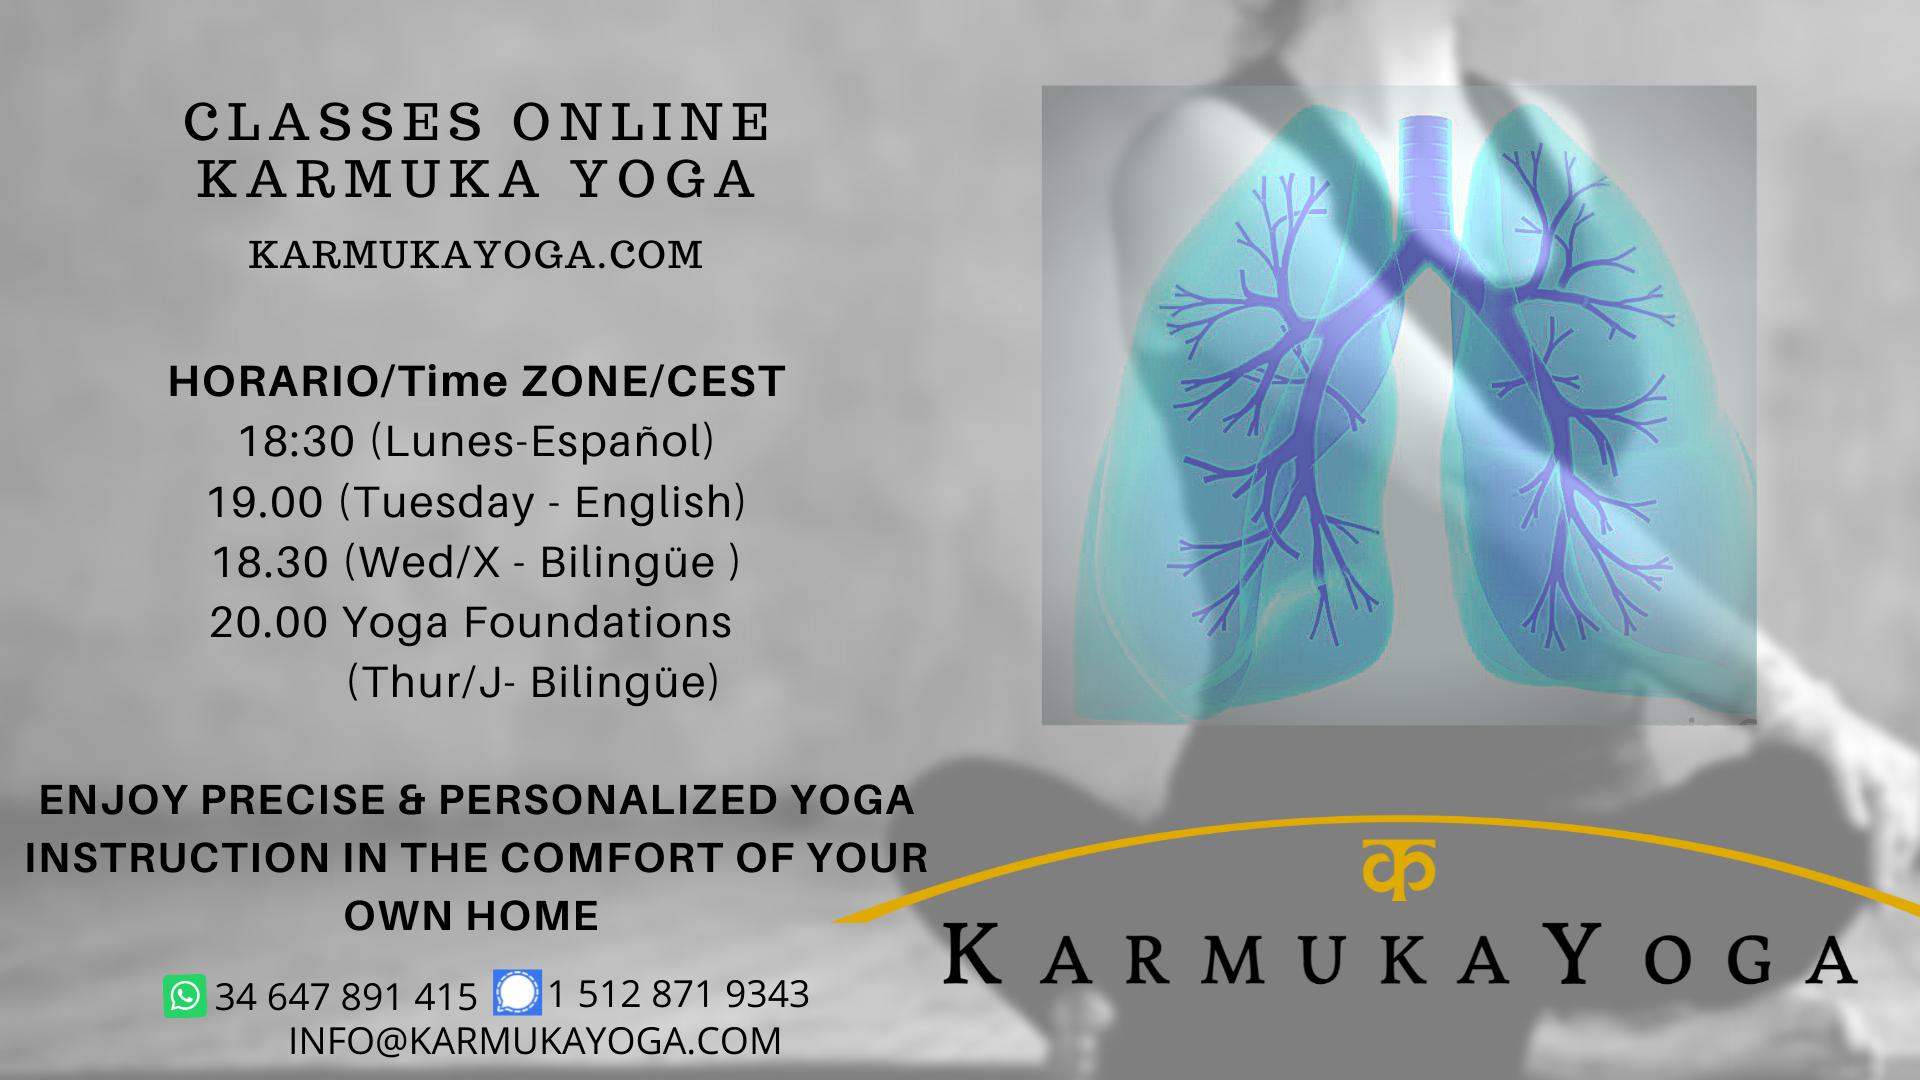 Karmuka Yoga online yoga classes. Iyengar. Yamuna Body Rolling Yoga Therapy